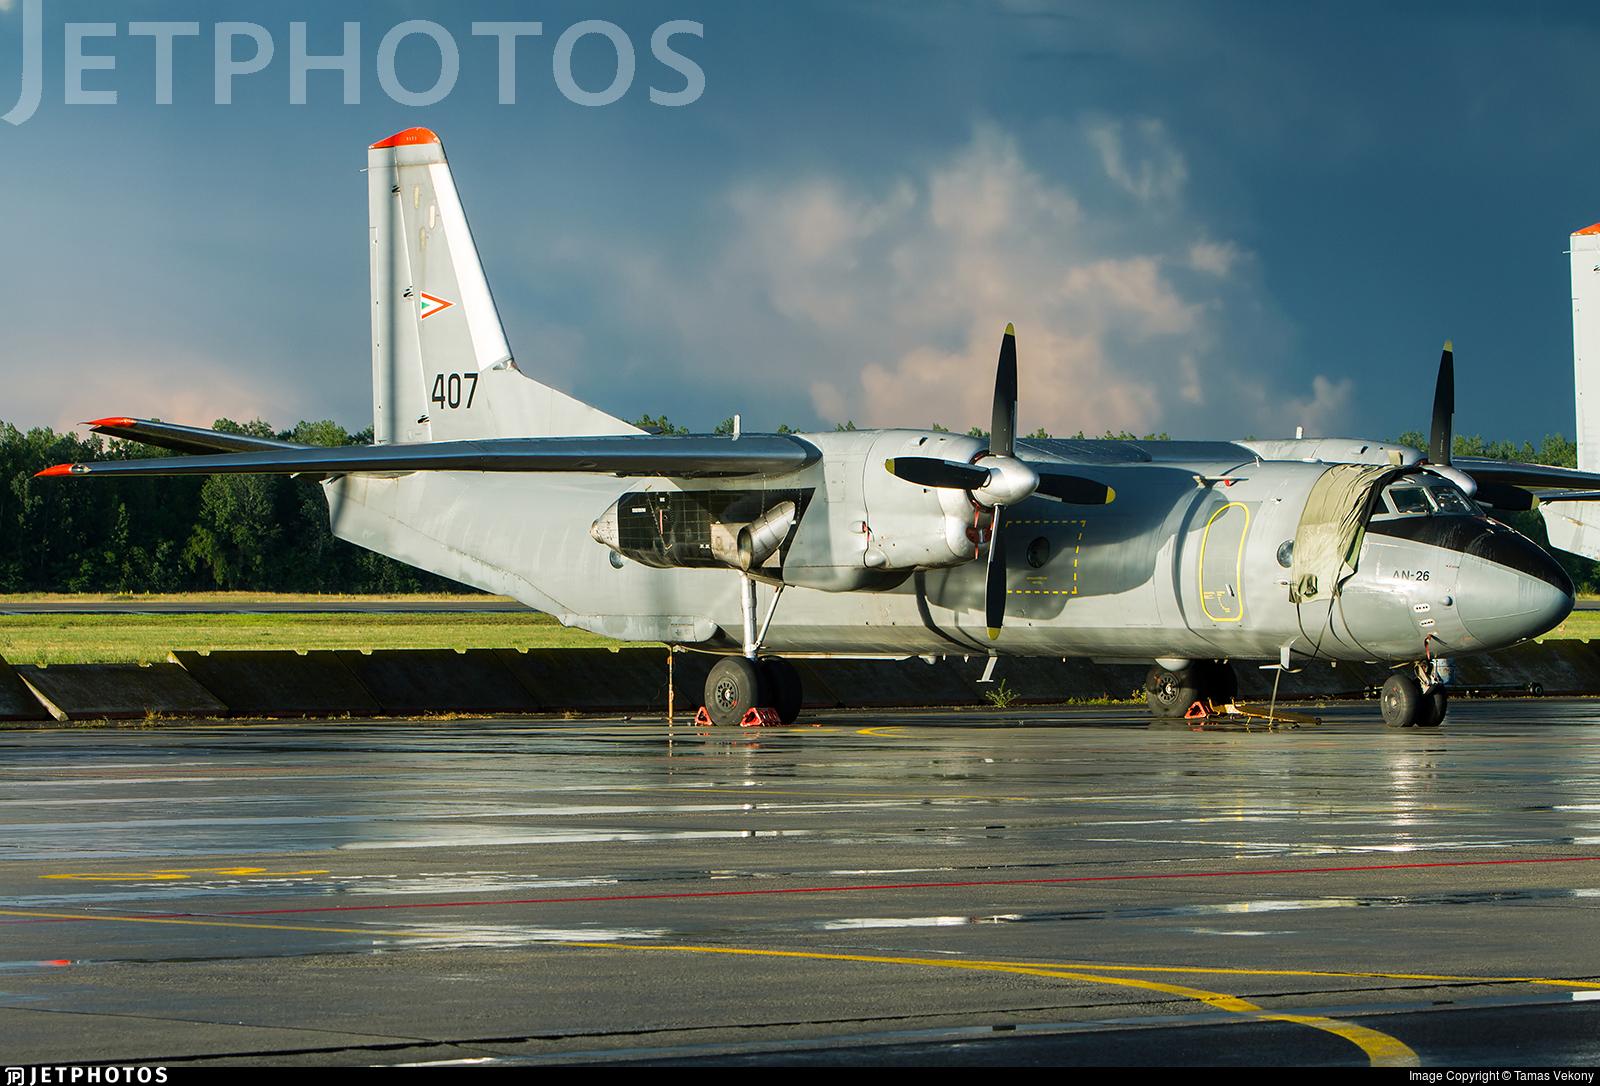 407 - Antonov An-26B - Hungary - Air Force